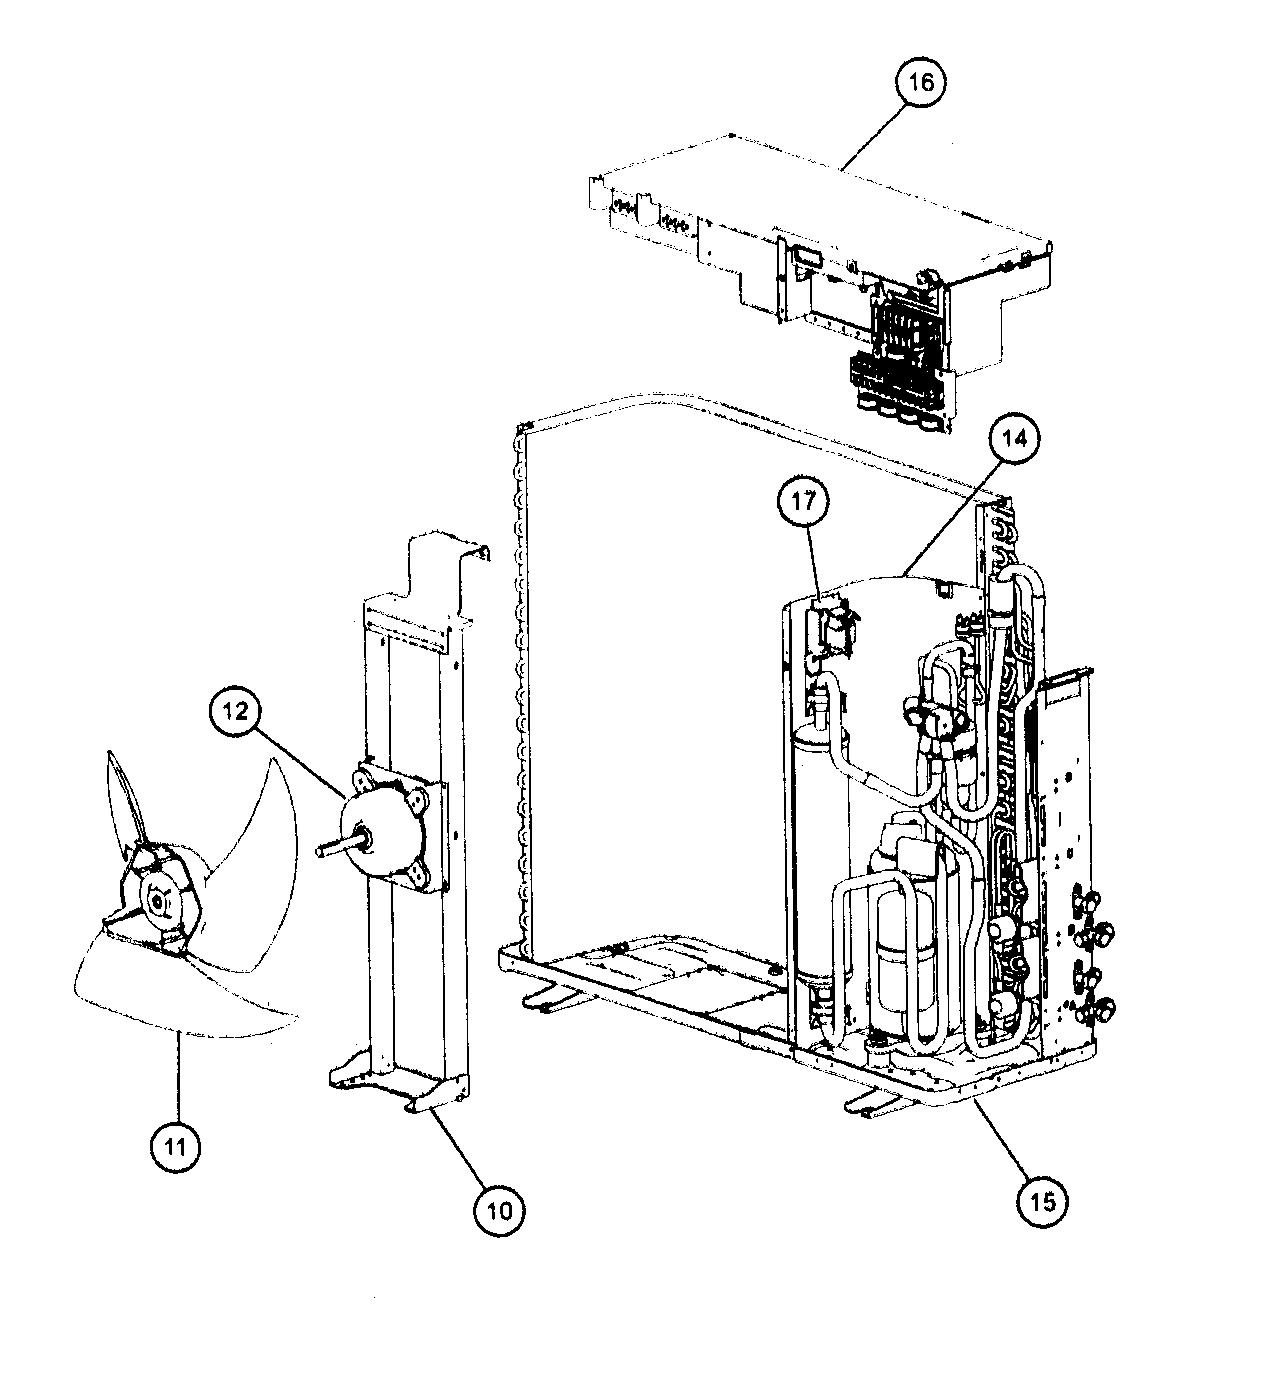 Friedrich model MR24DY3F air-conditioner/heat pump(outside